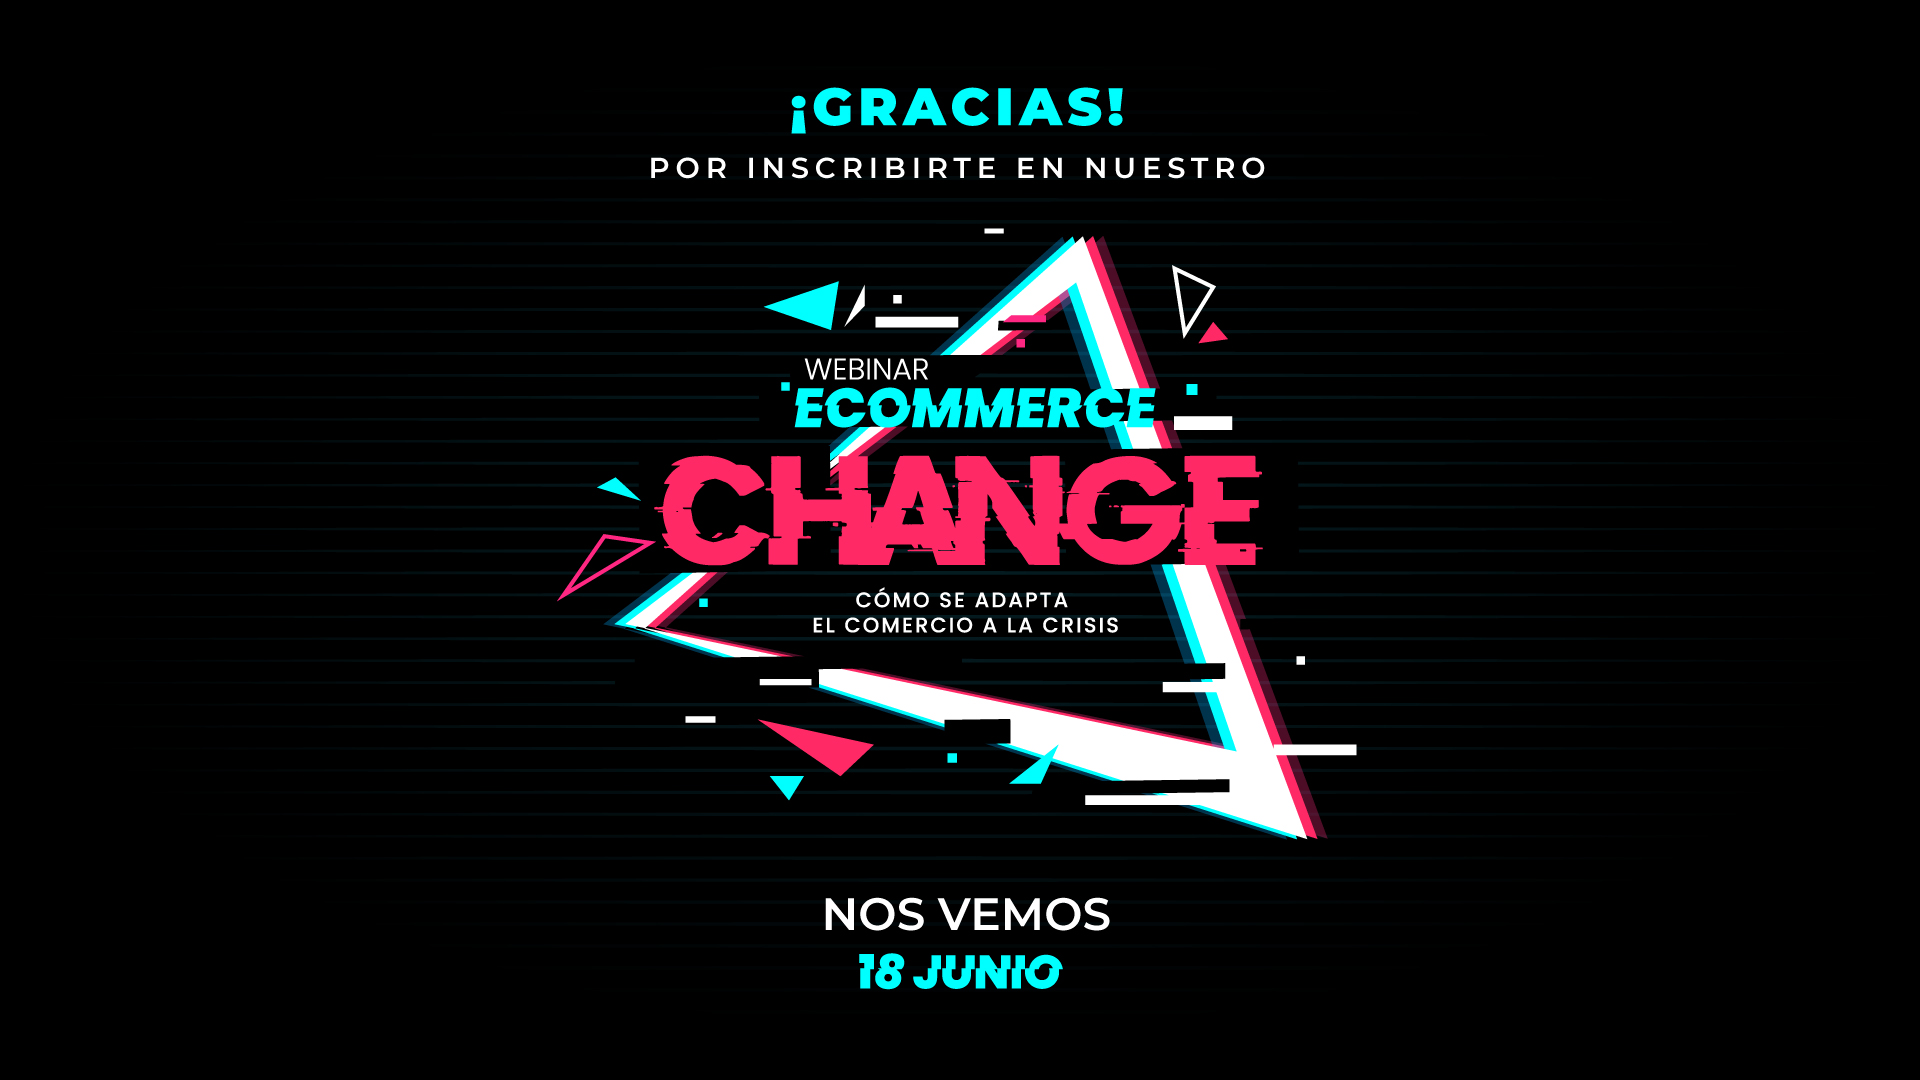 Webinar Gracias webinar ecommerce change